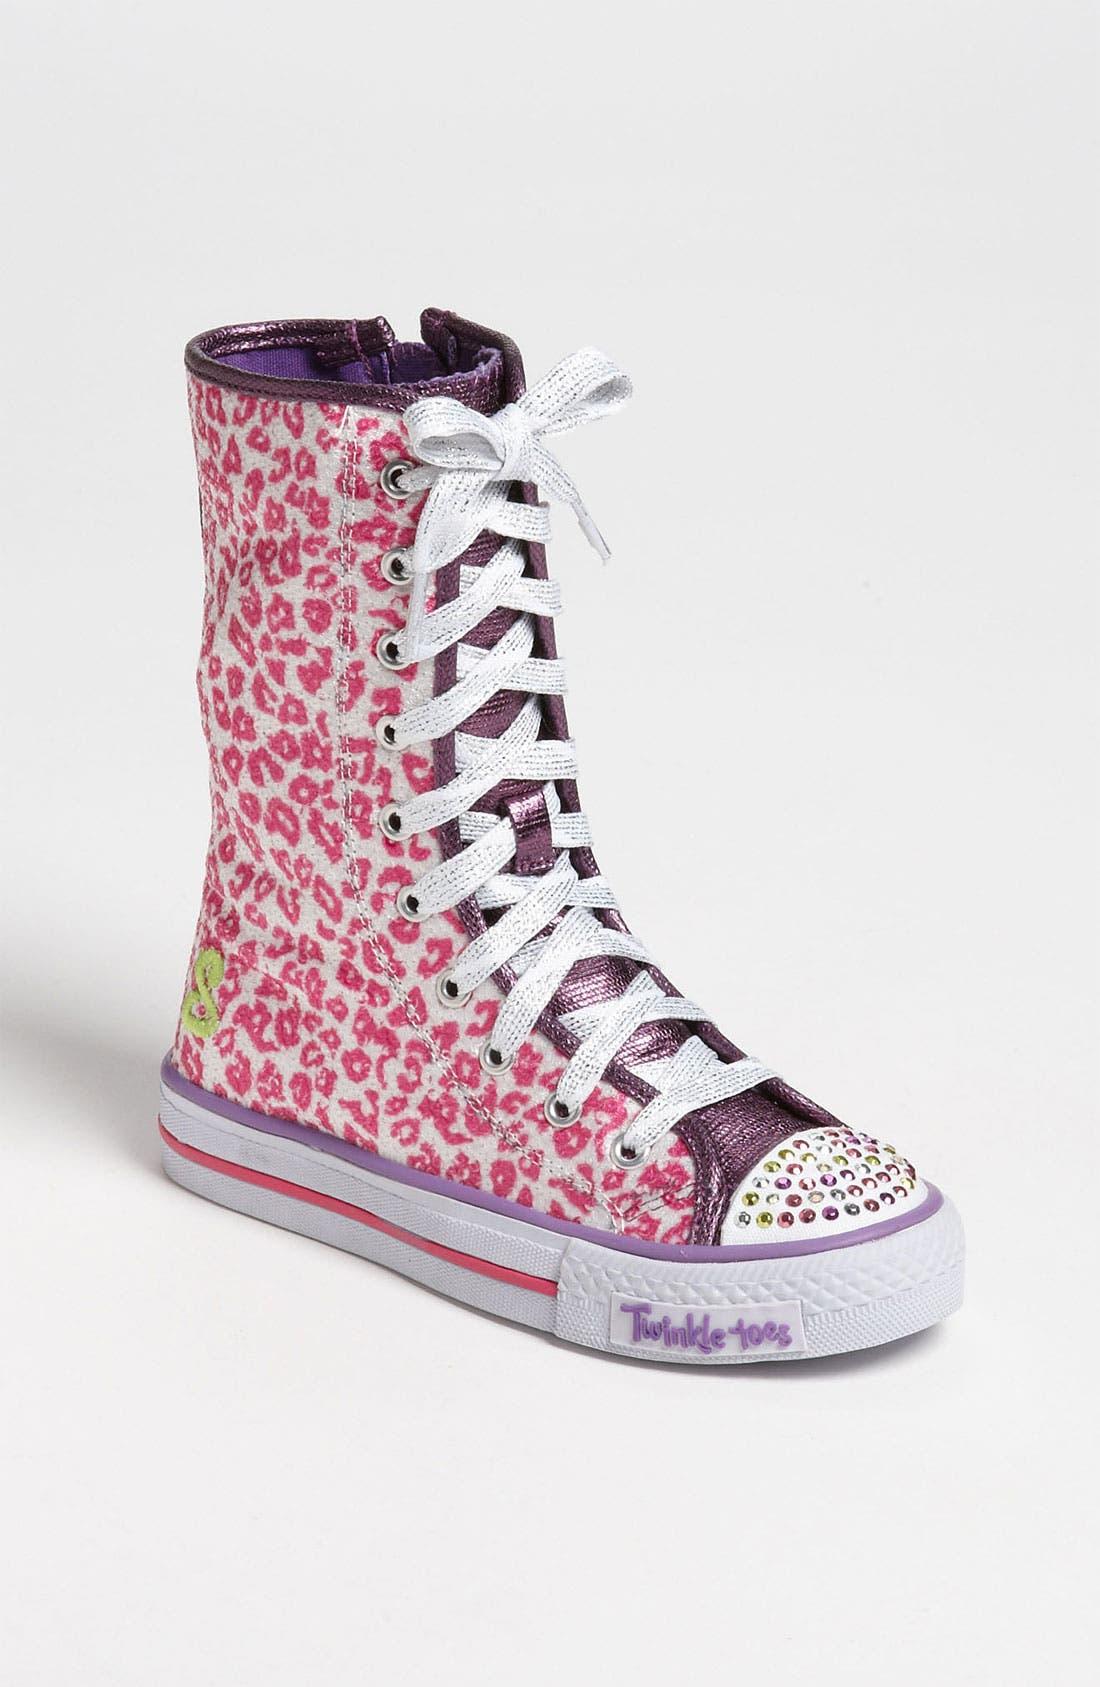 Main Image - SKECHERS 'Shuffles - Notorious' Sneaker (Toddler & Little Kid)